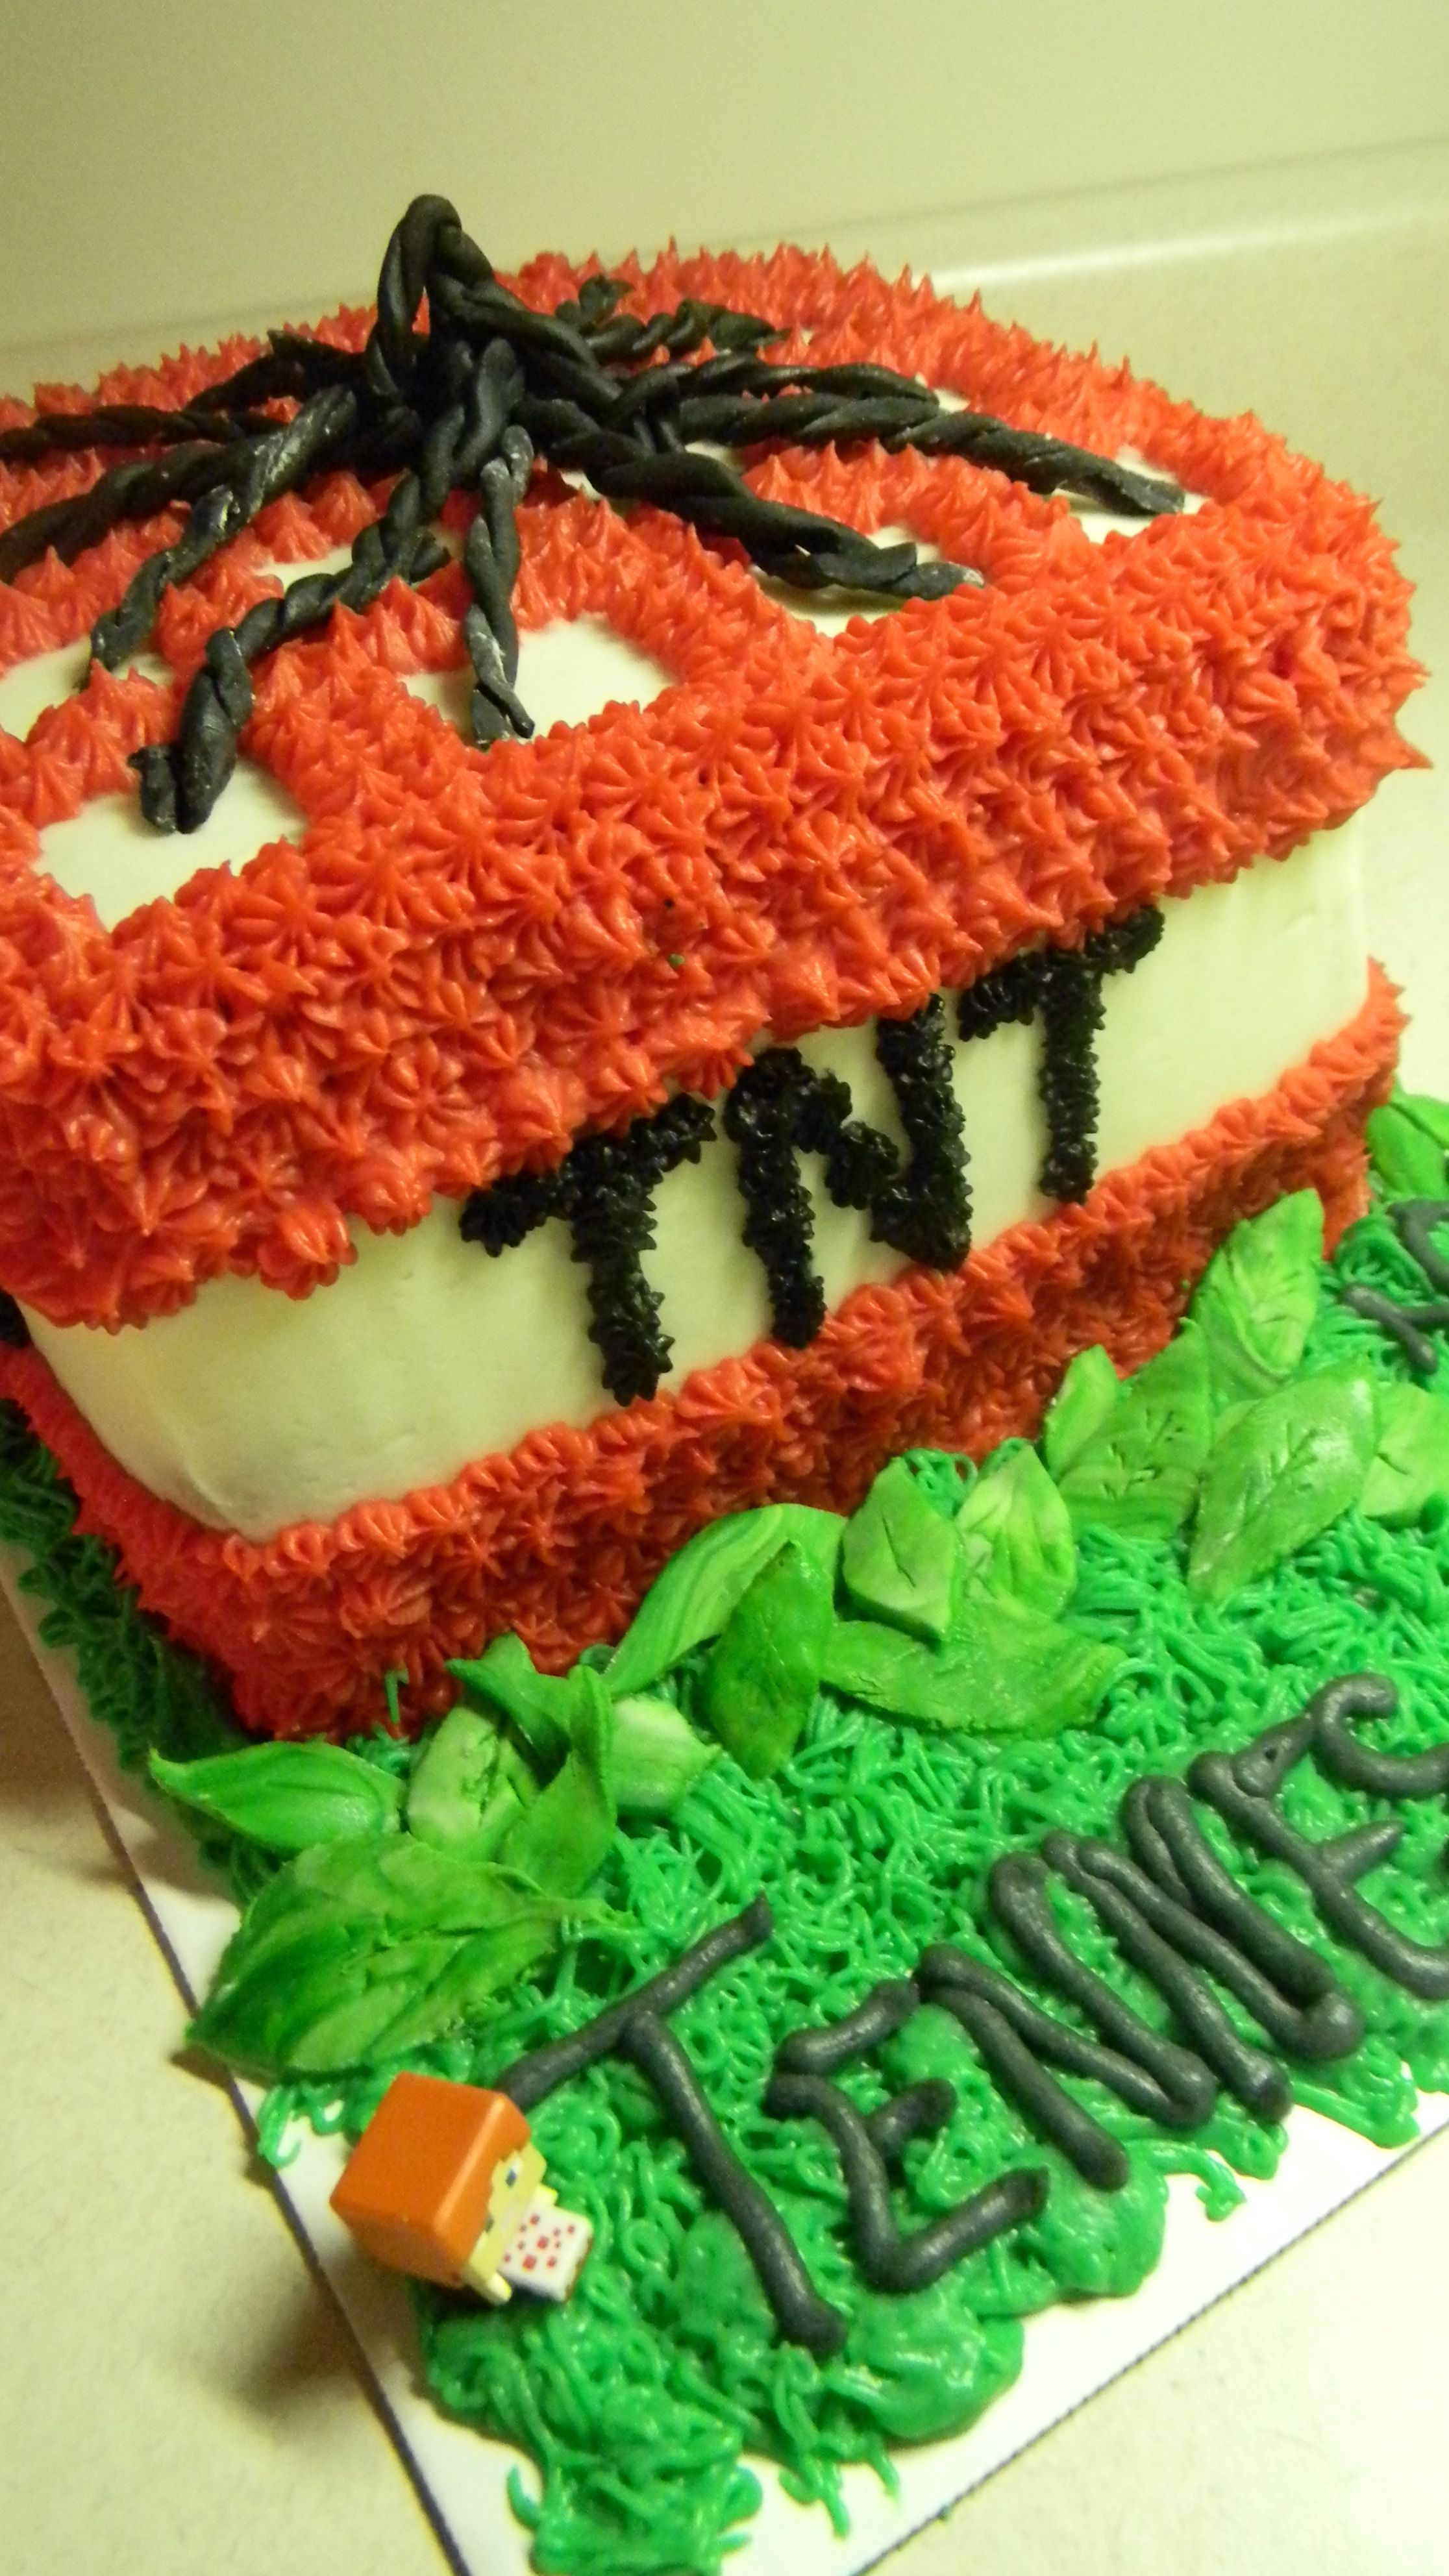 Minecraft Tnt Cake With Images Minecraft Cake Minecraft Birthday